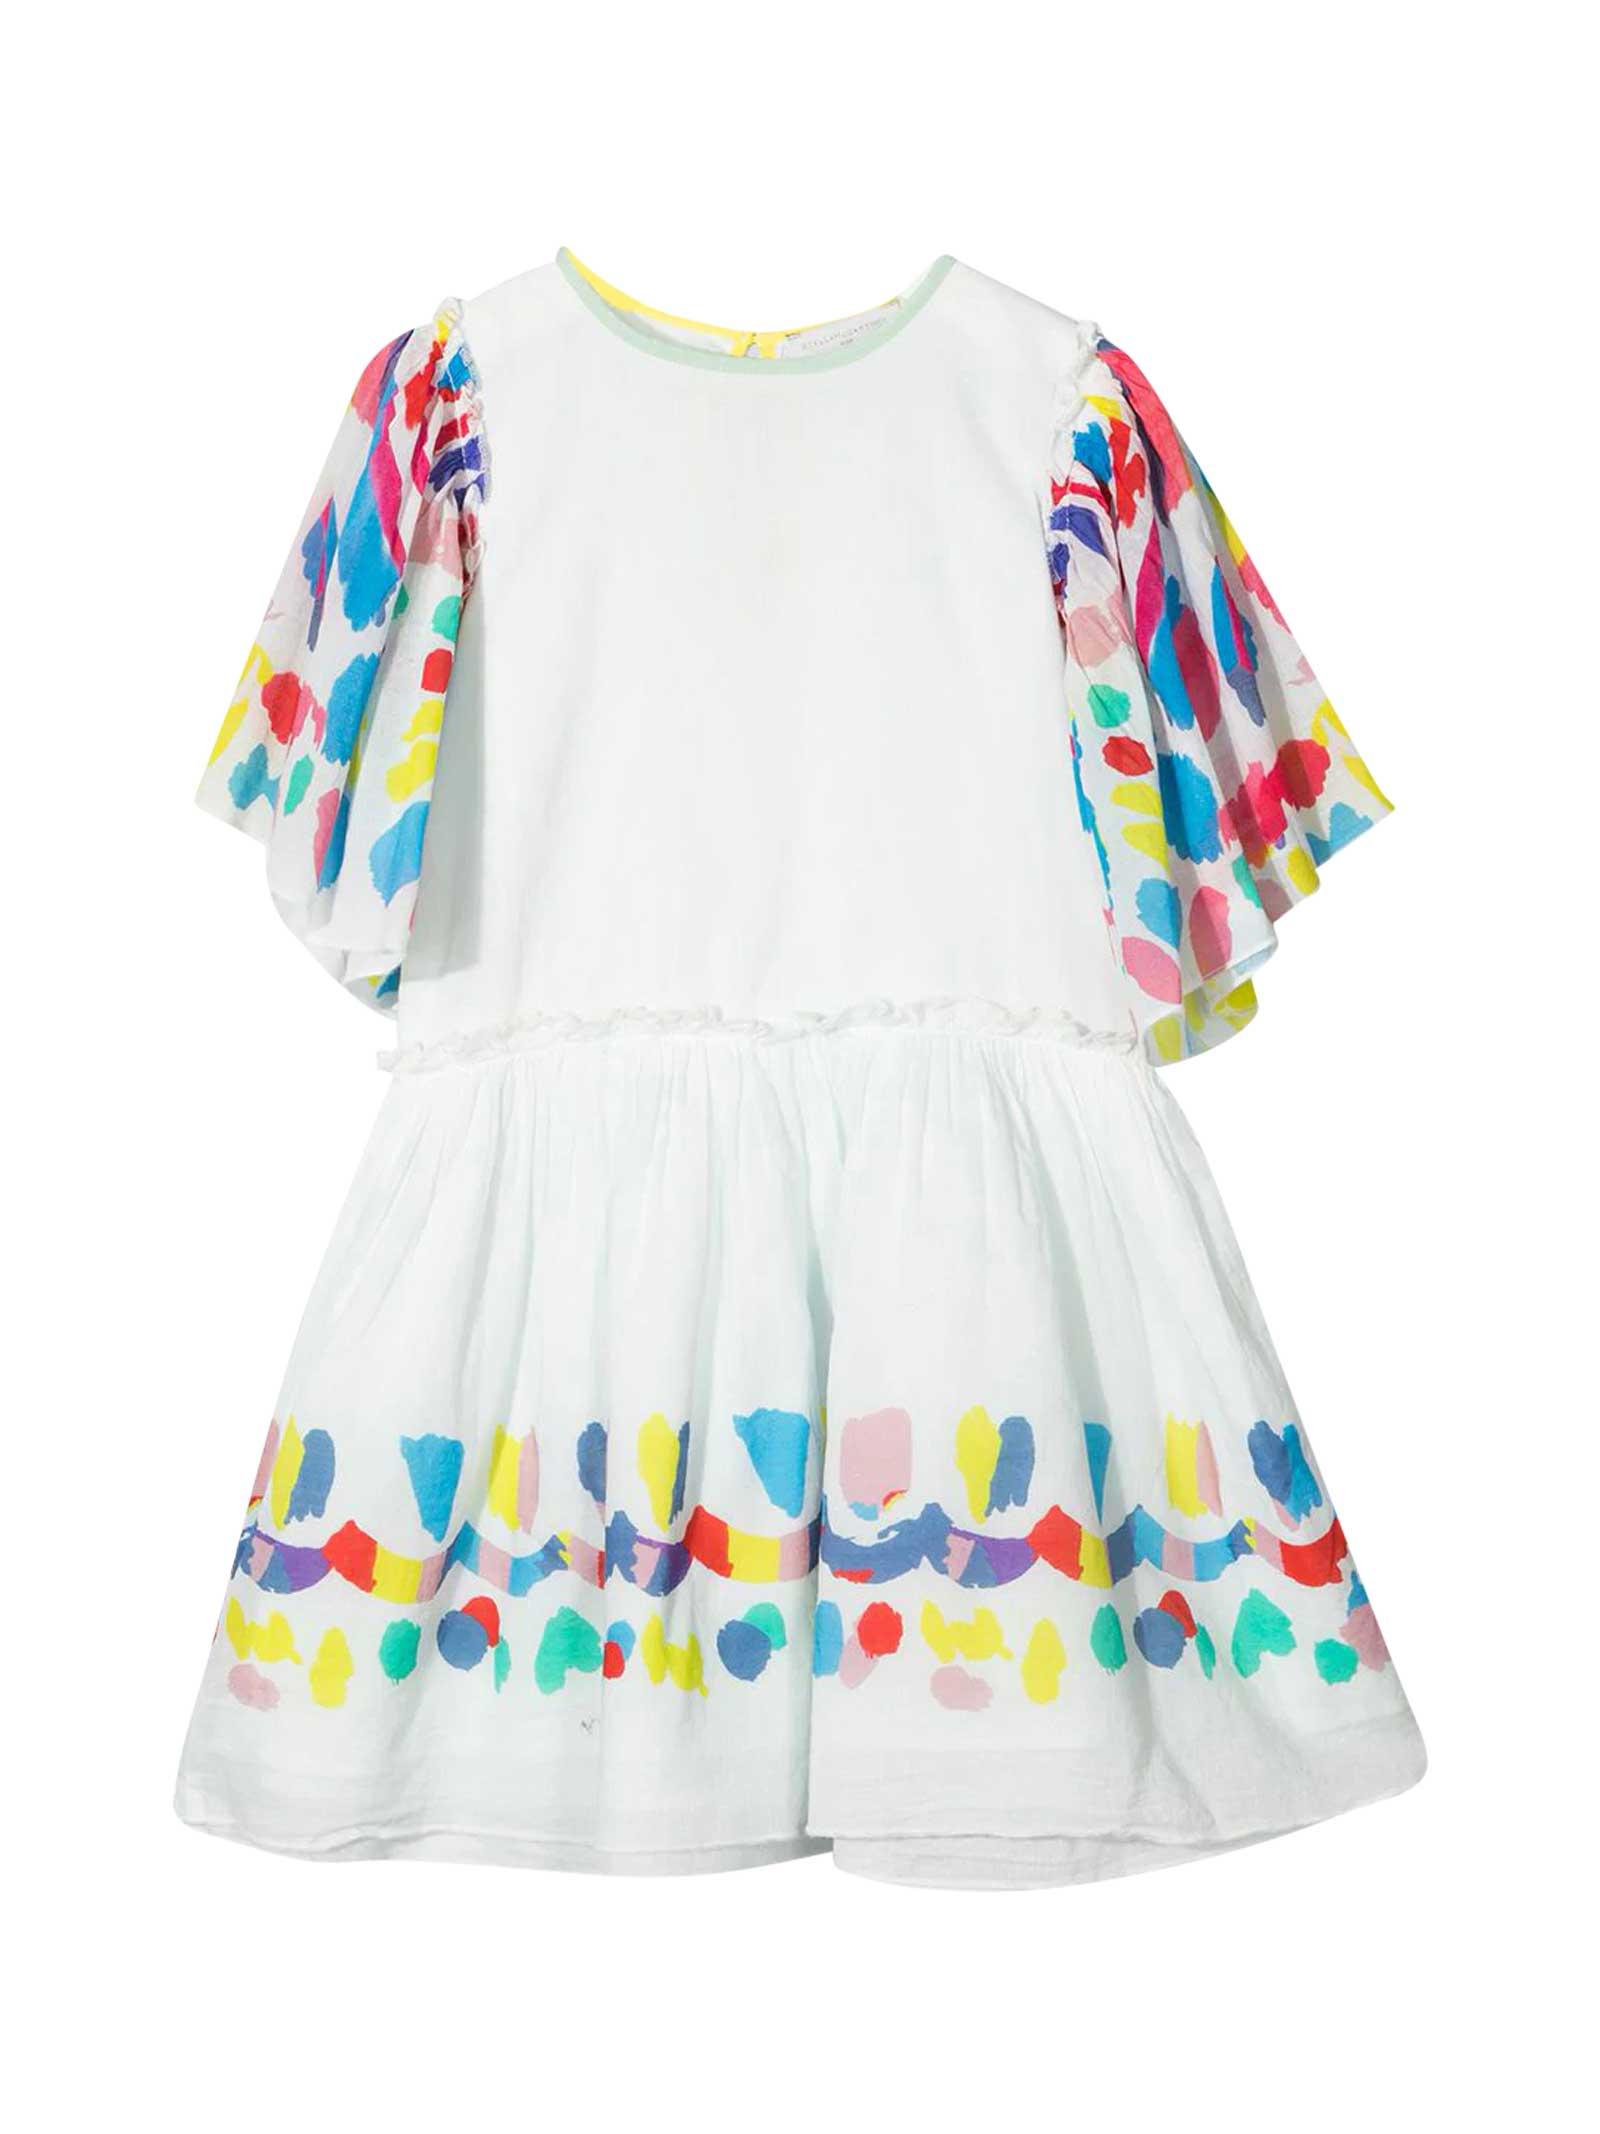 Buy Stella McCartney Kids White Dress With Multicolor Print online, shop Stella McCartney Kids with free shipping